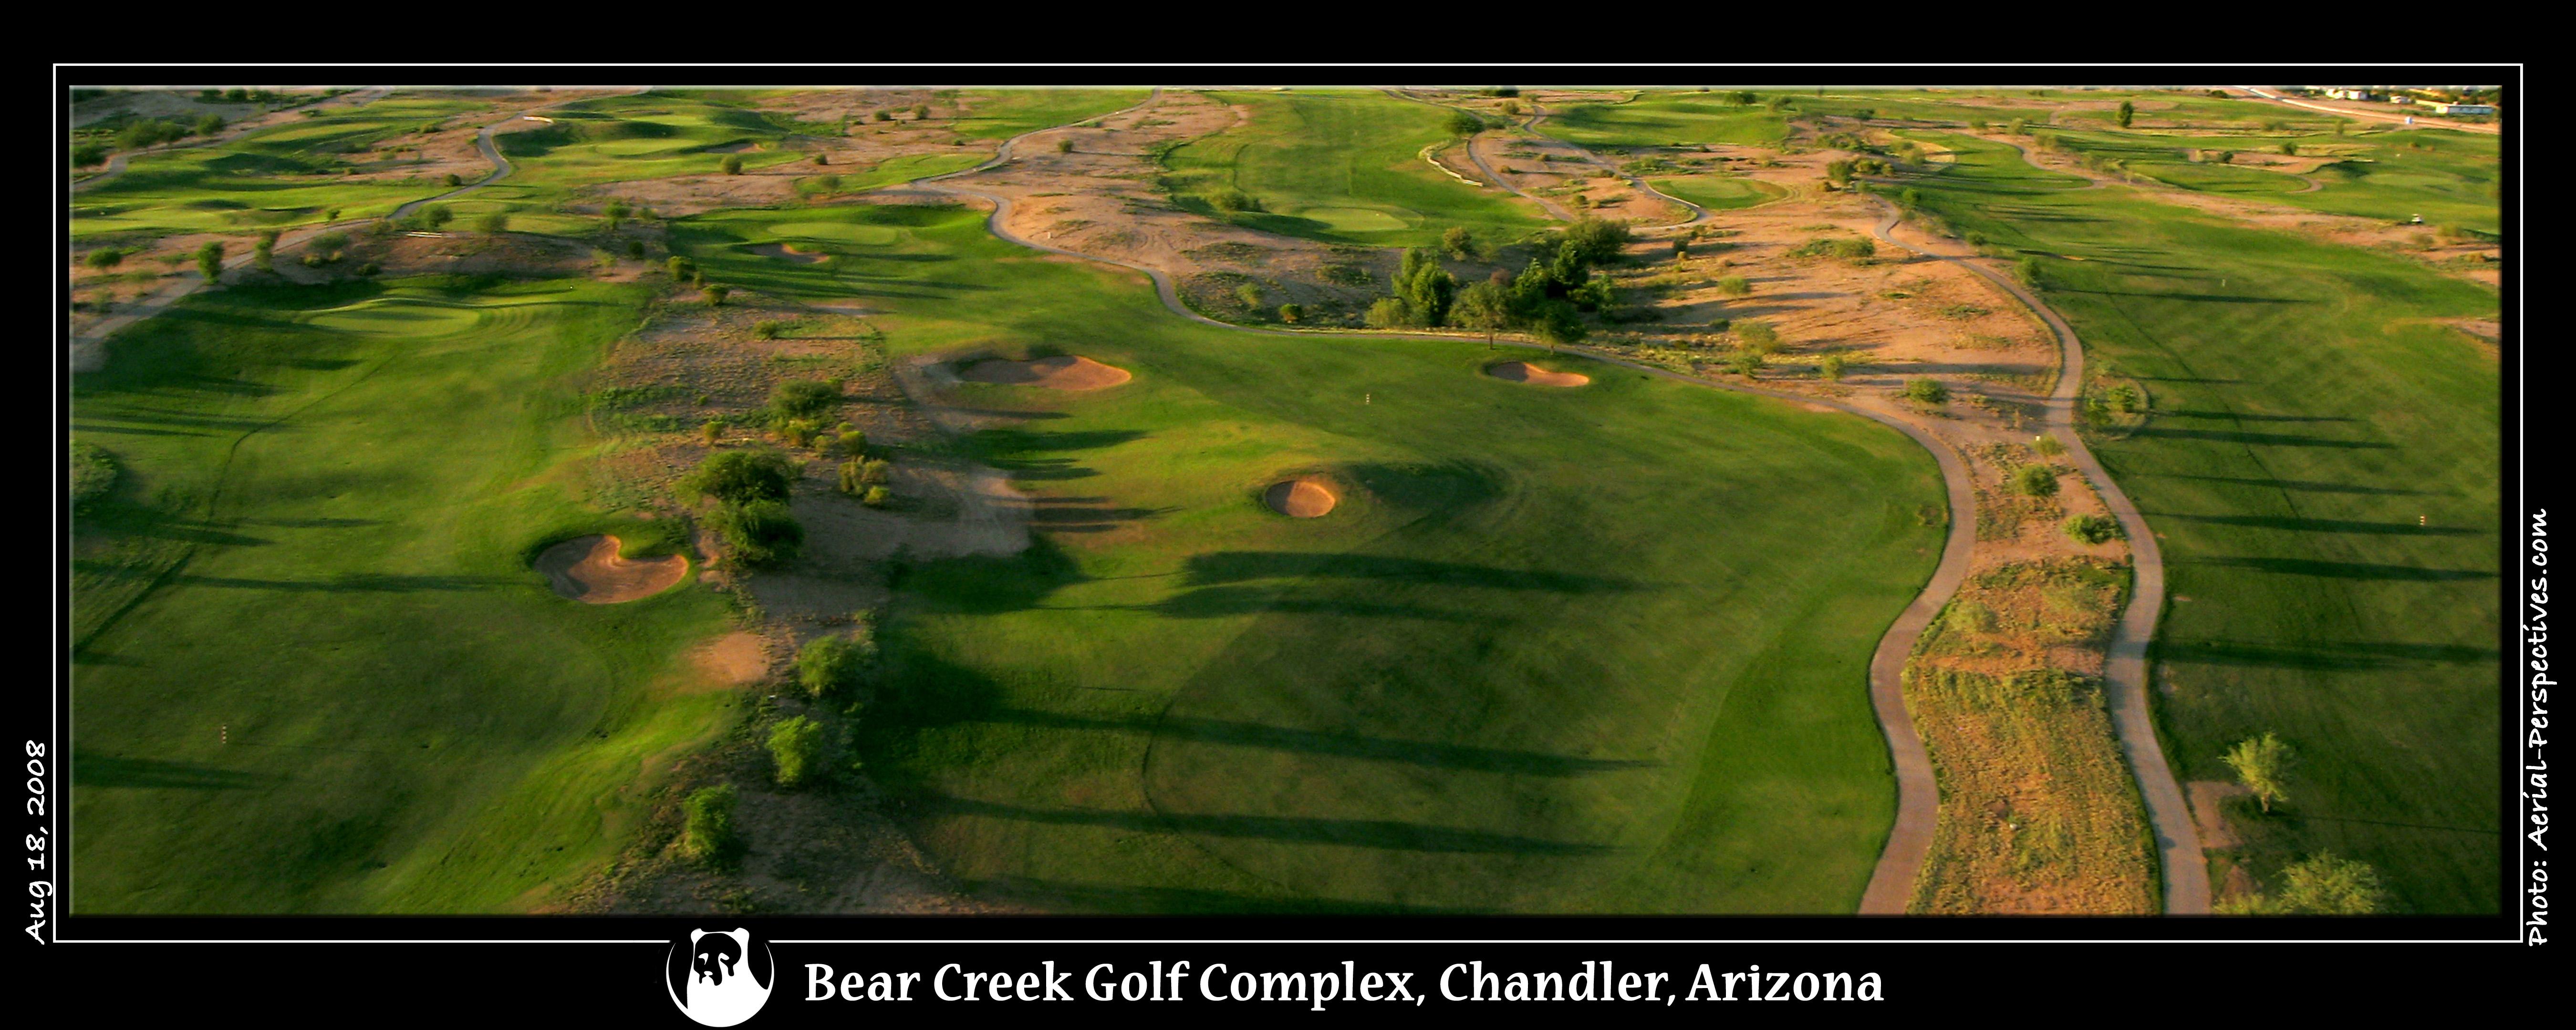 Bear Creek Golf Complex image 2